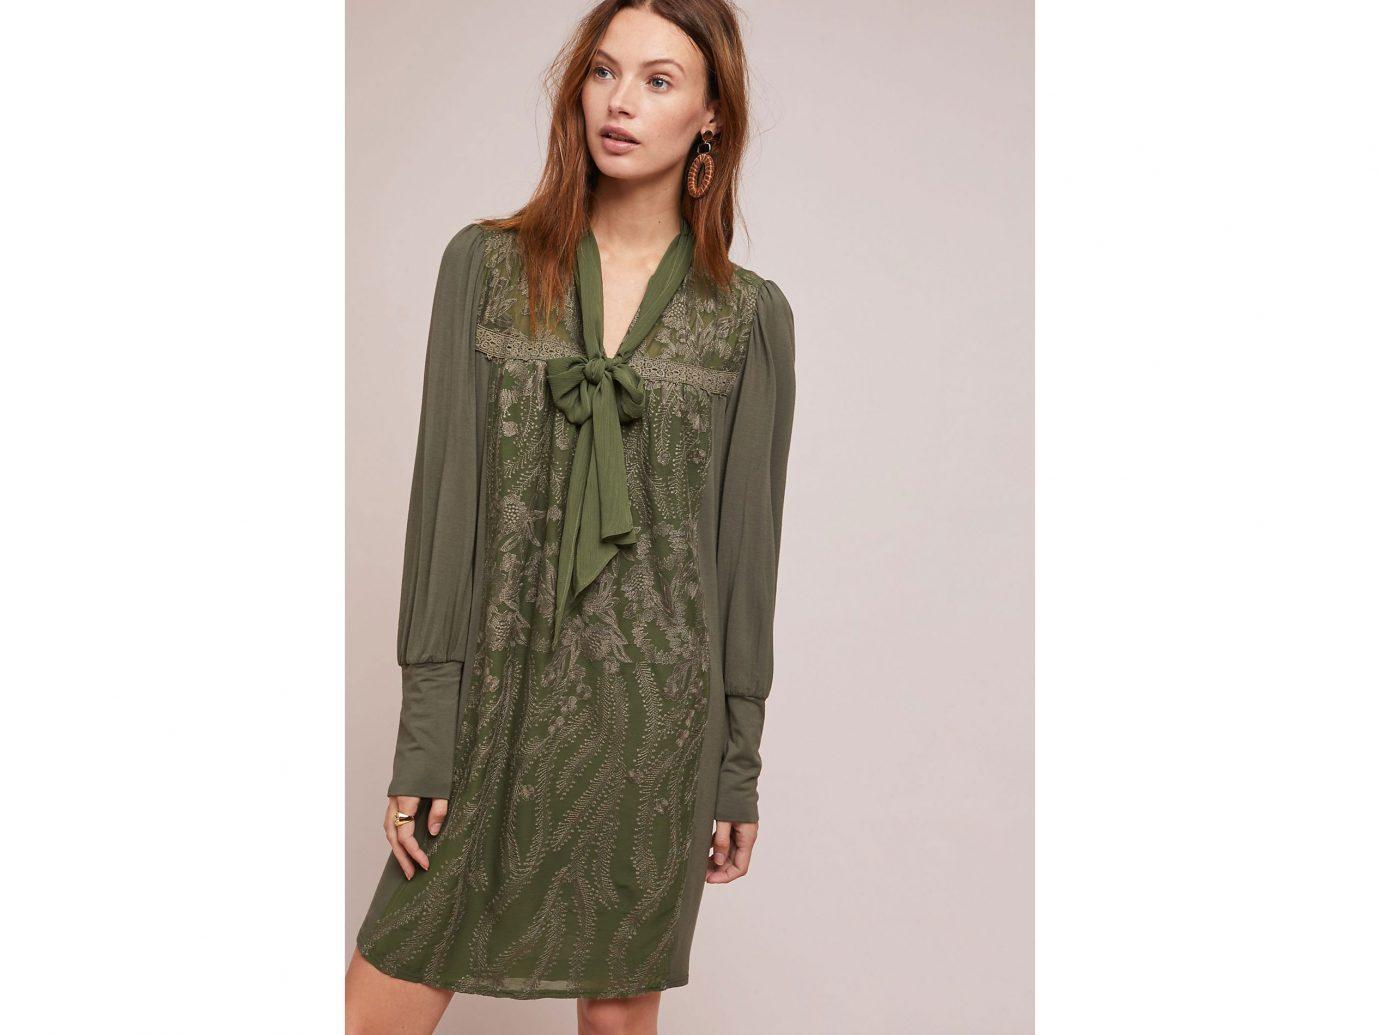 Isla Embroidered Tunic Dress